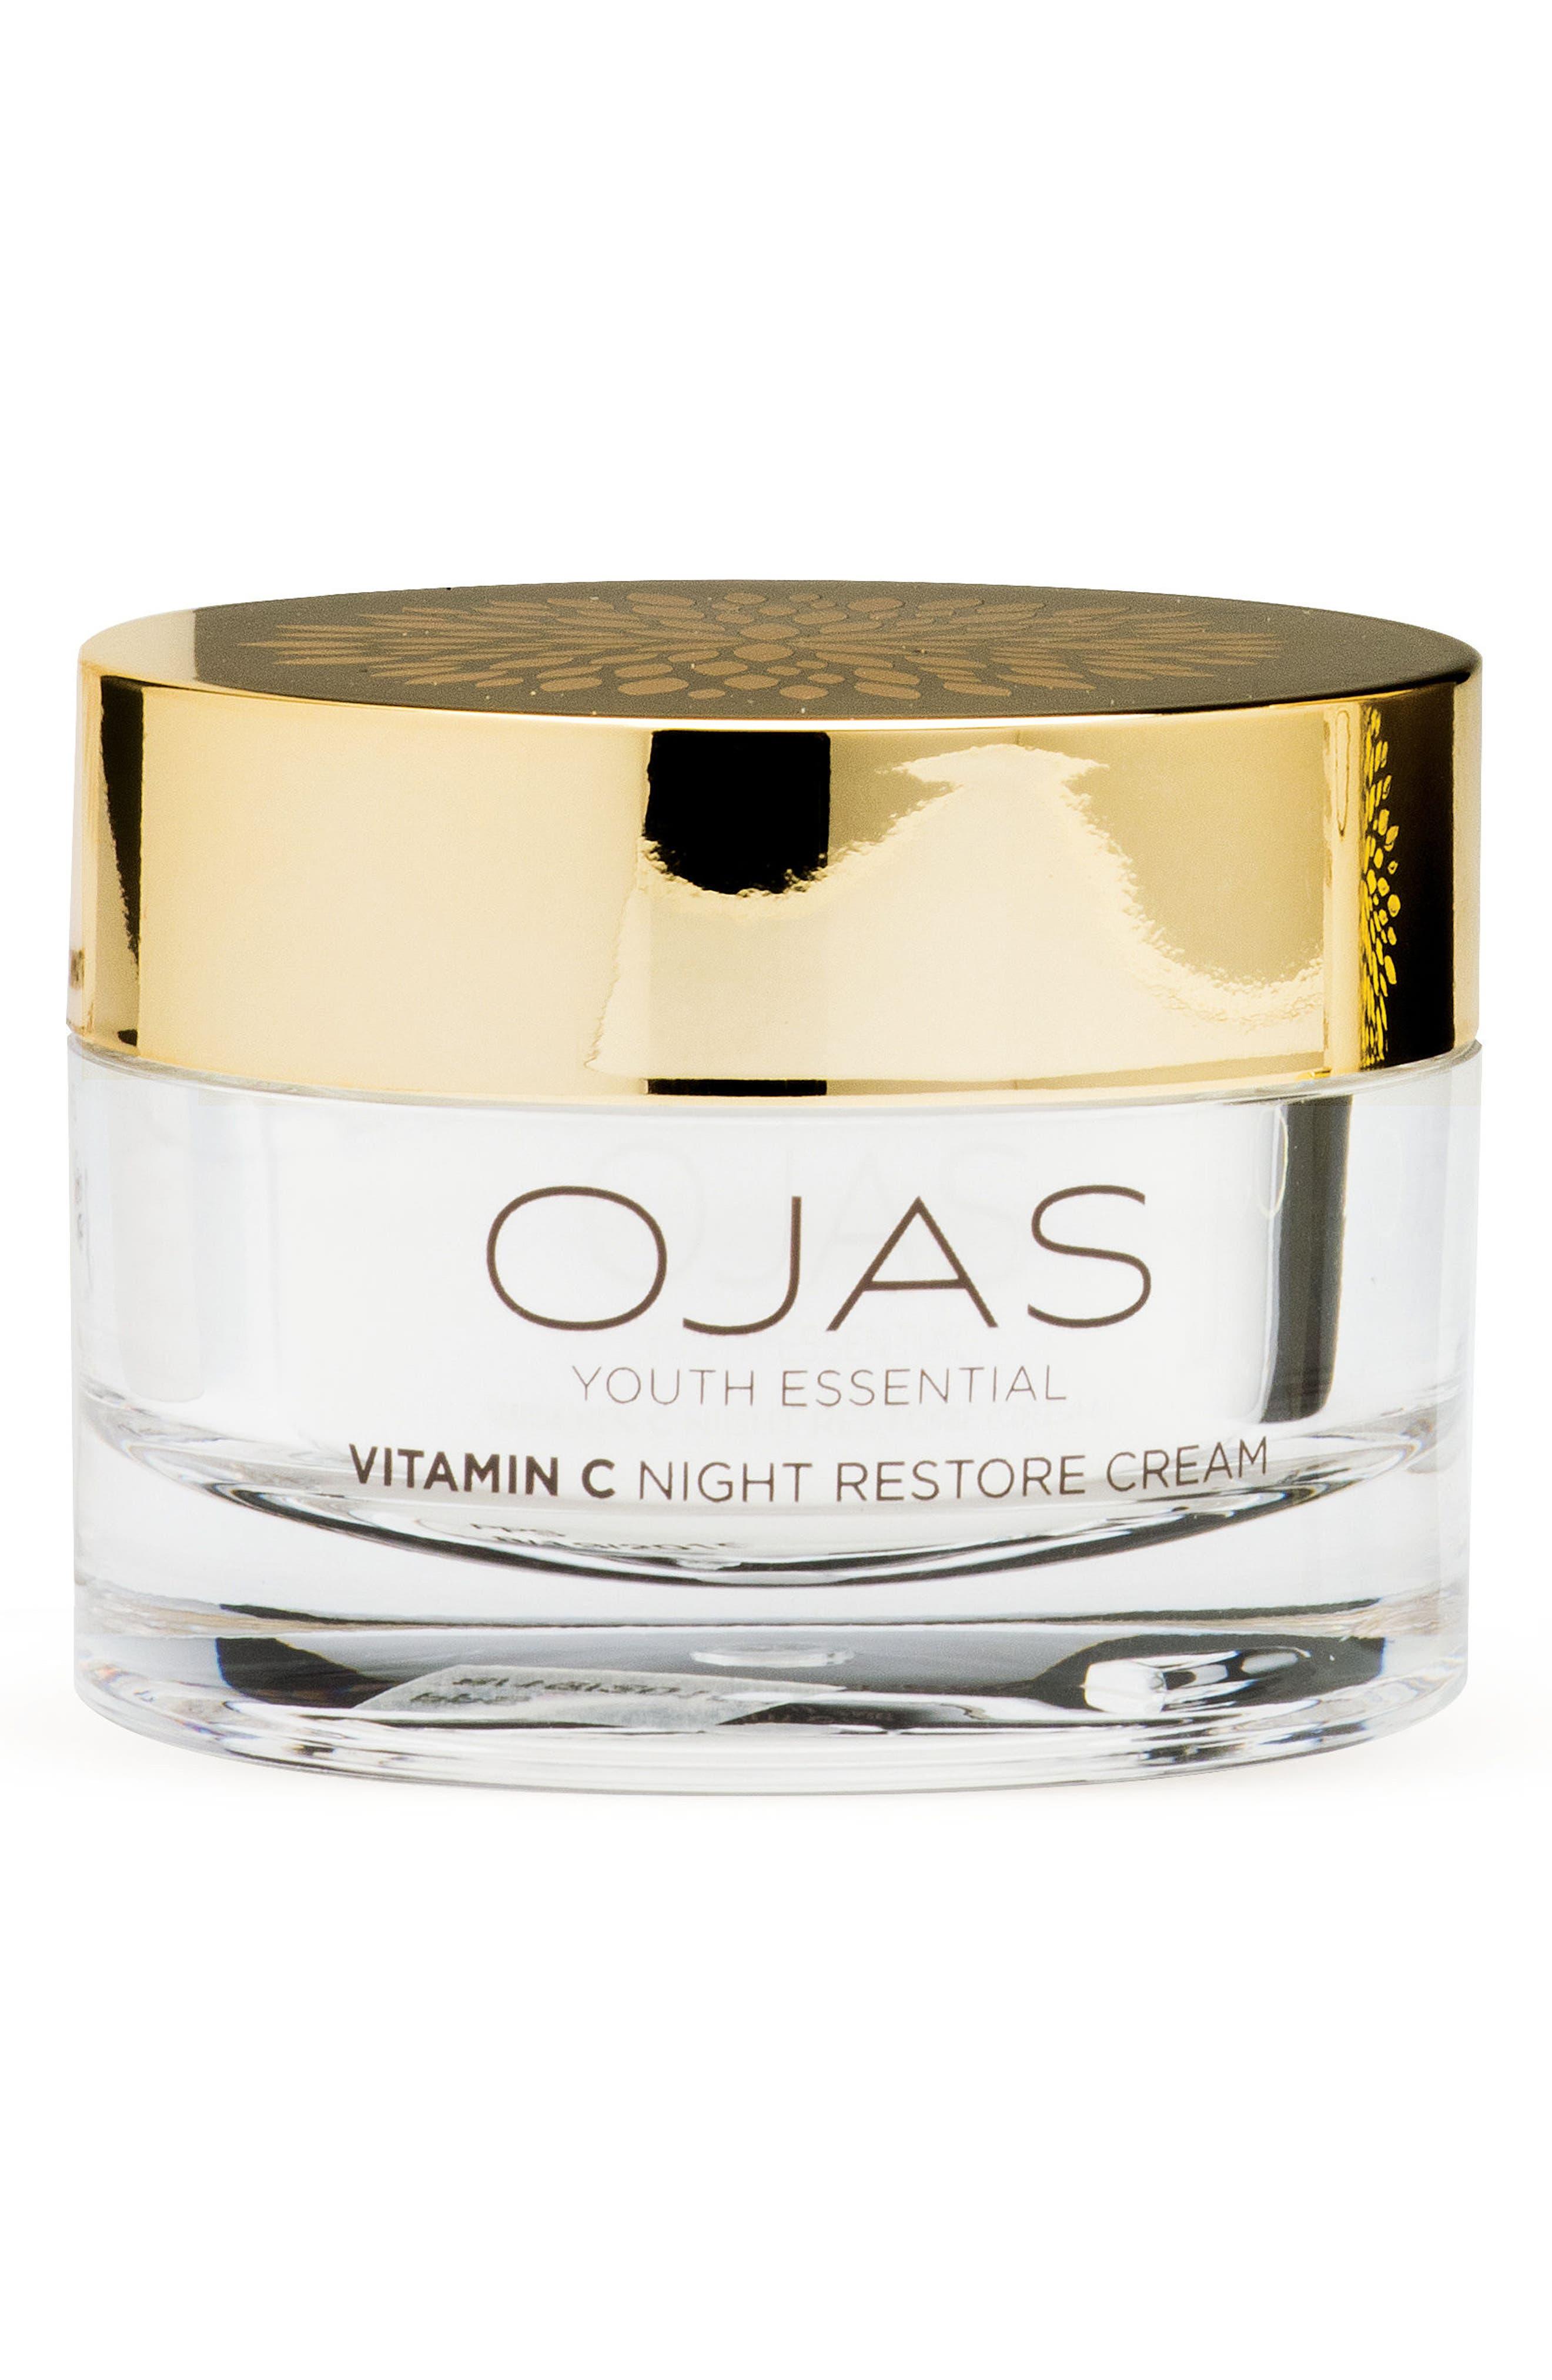 OJAS Vitamin C Night Restore Cream